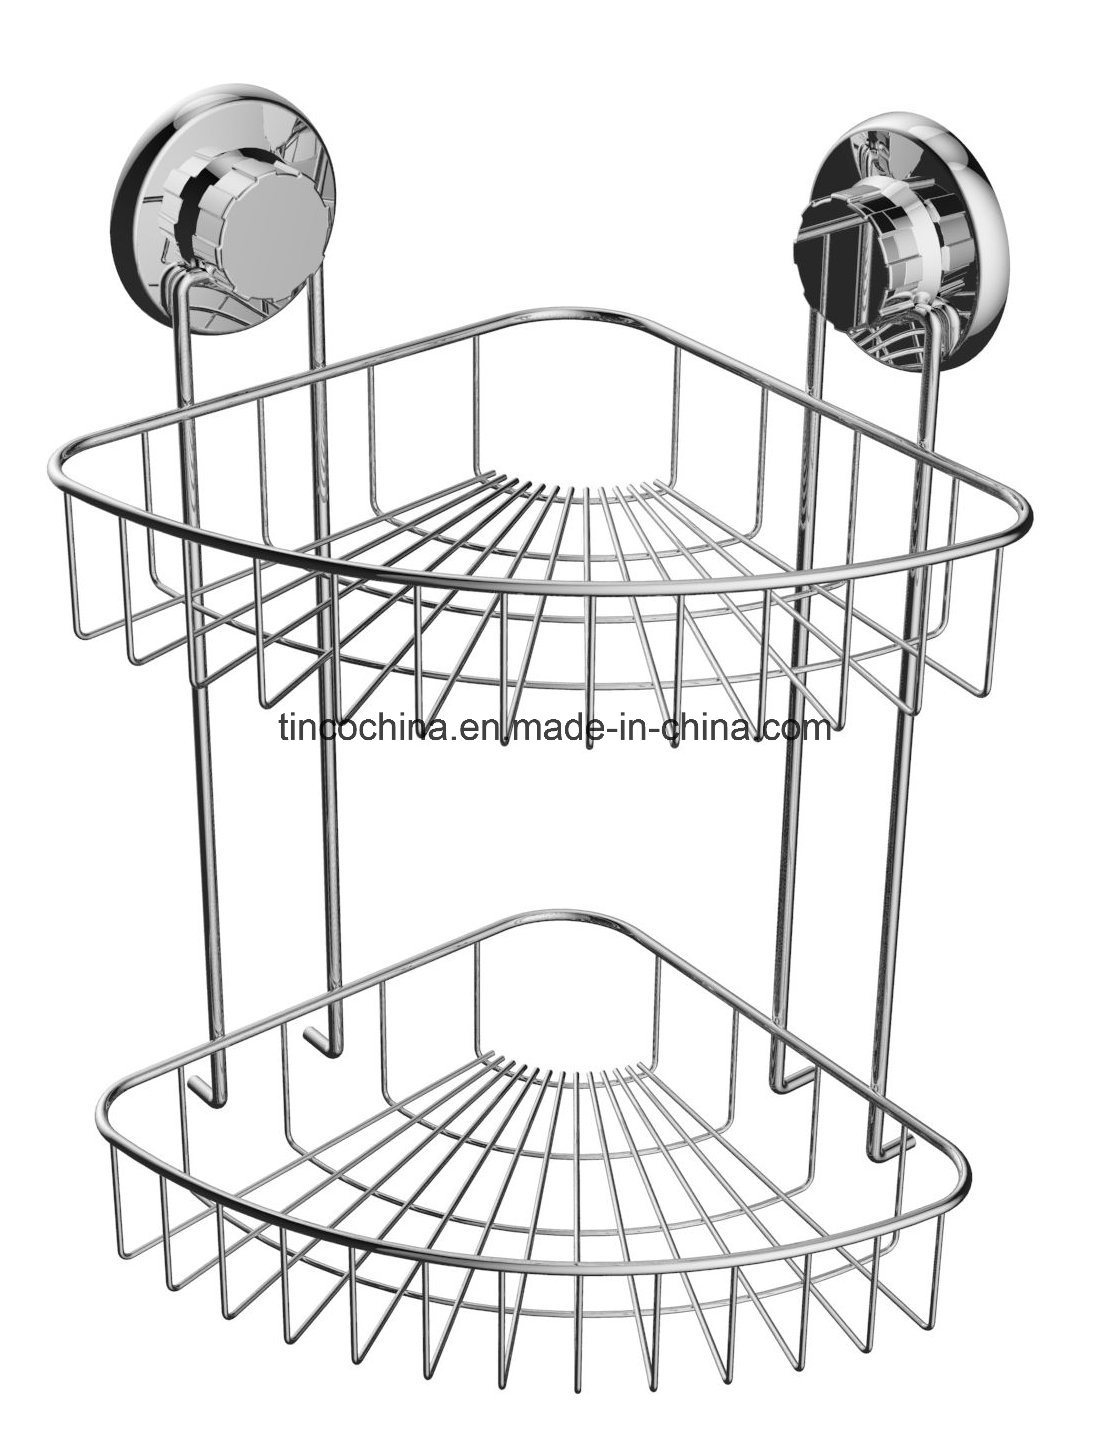 Bathroom Shower Caddy Organizer Shelf Rack with Suction Cup